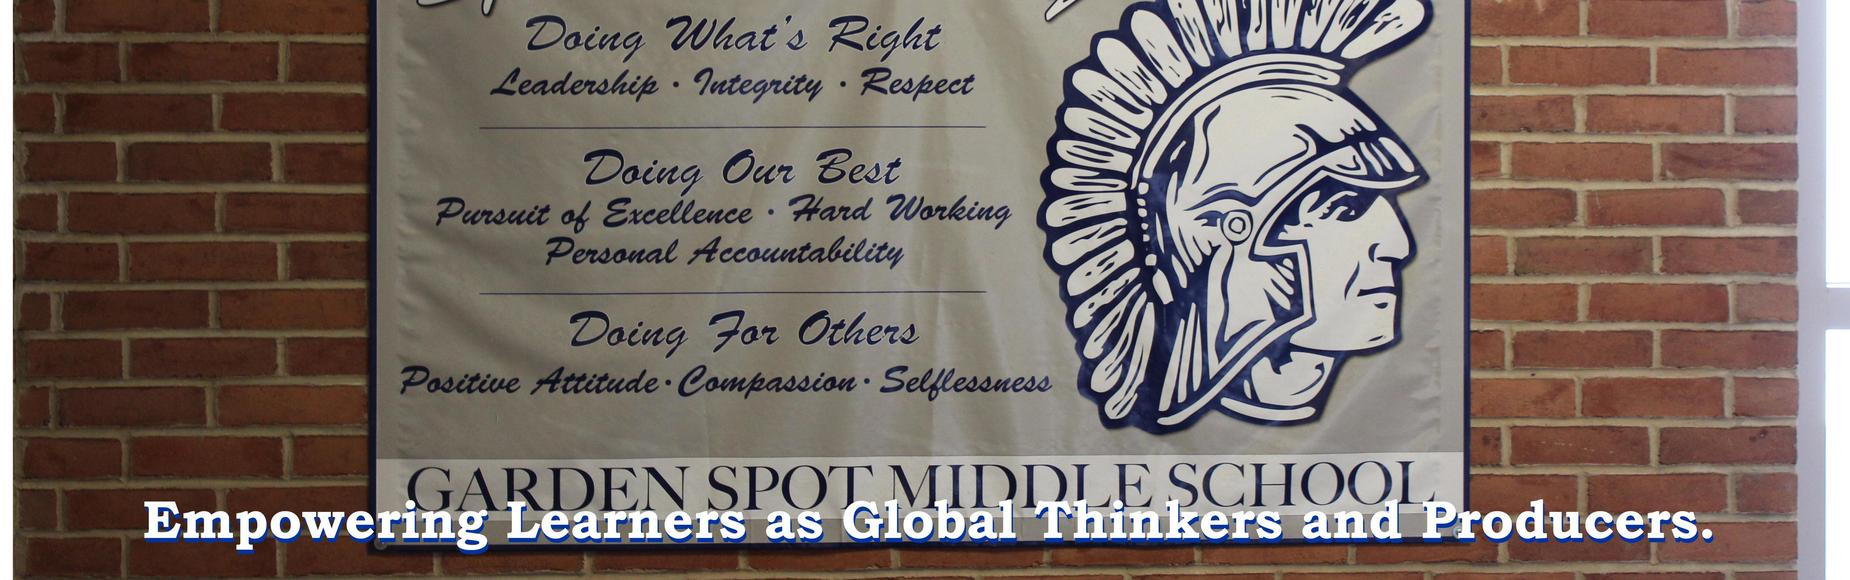 Garden Spot Middle School The Spartan Way Photo